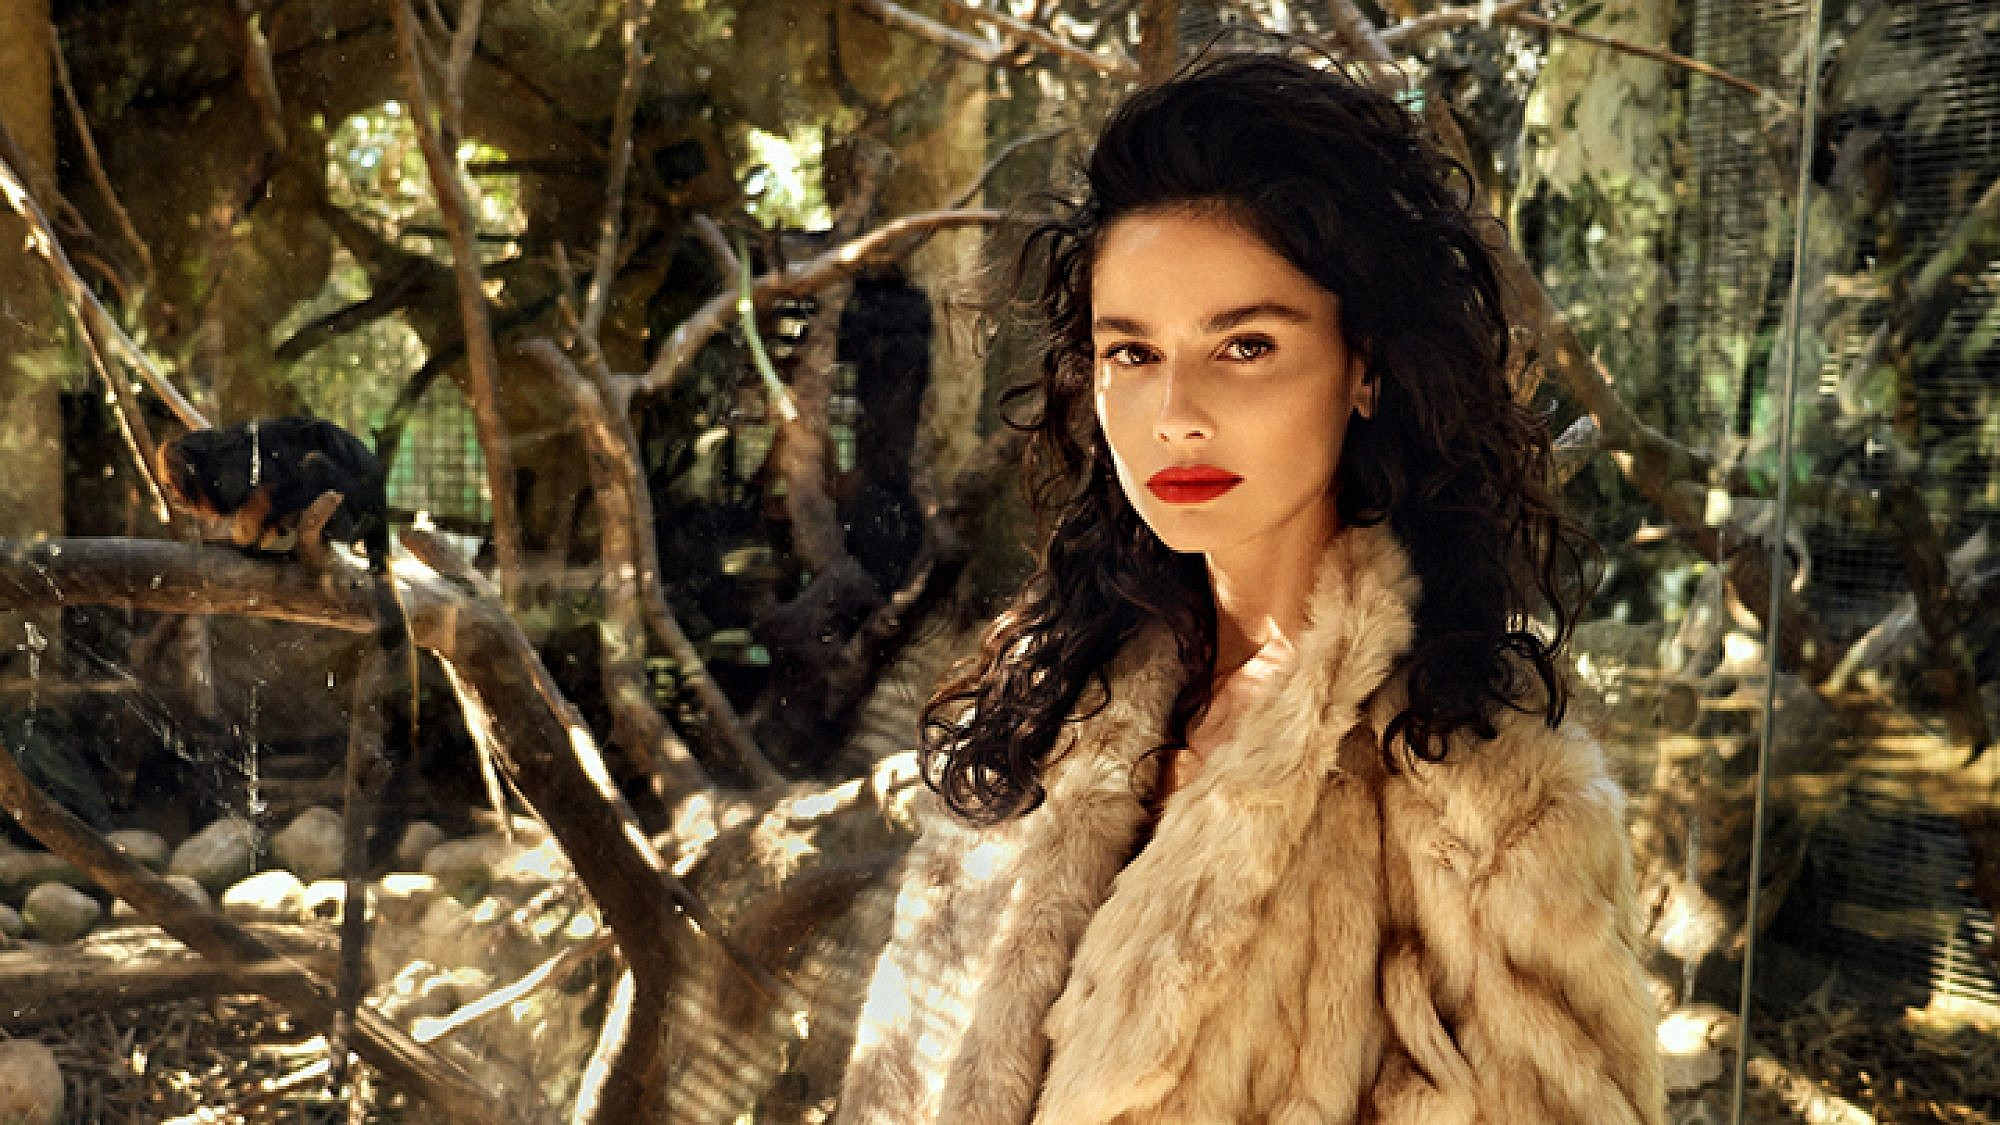 מעיל: זארה   צילום: אייל נבו